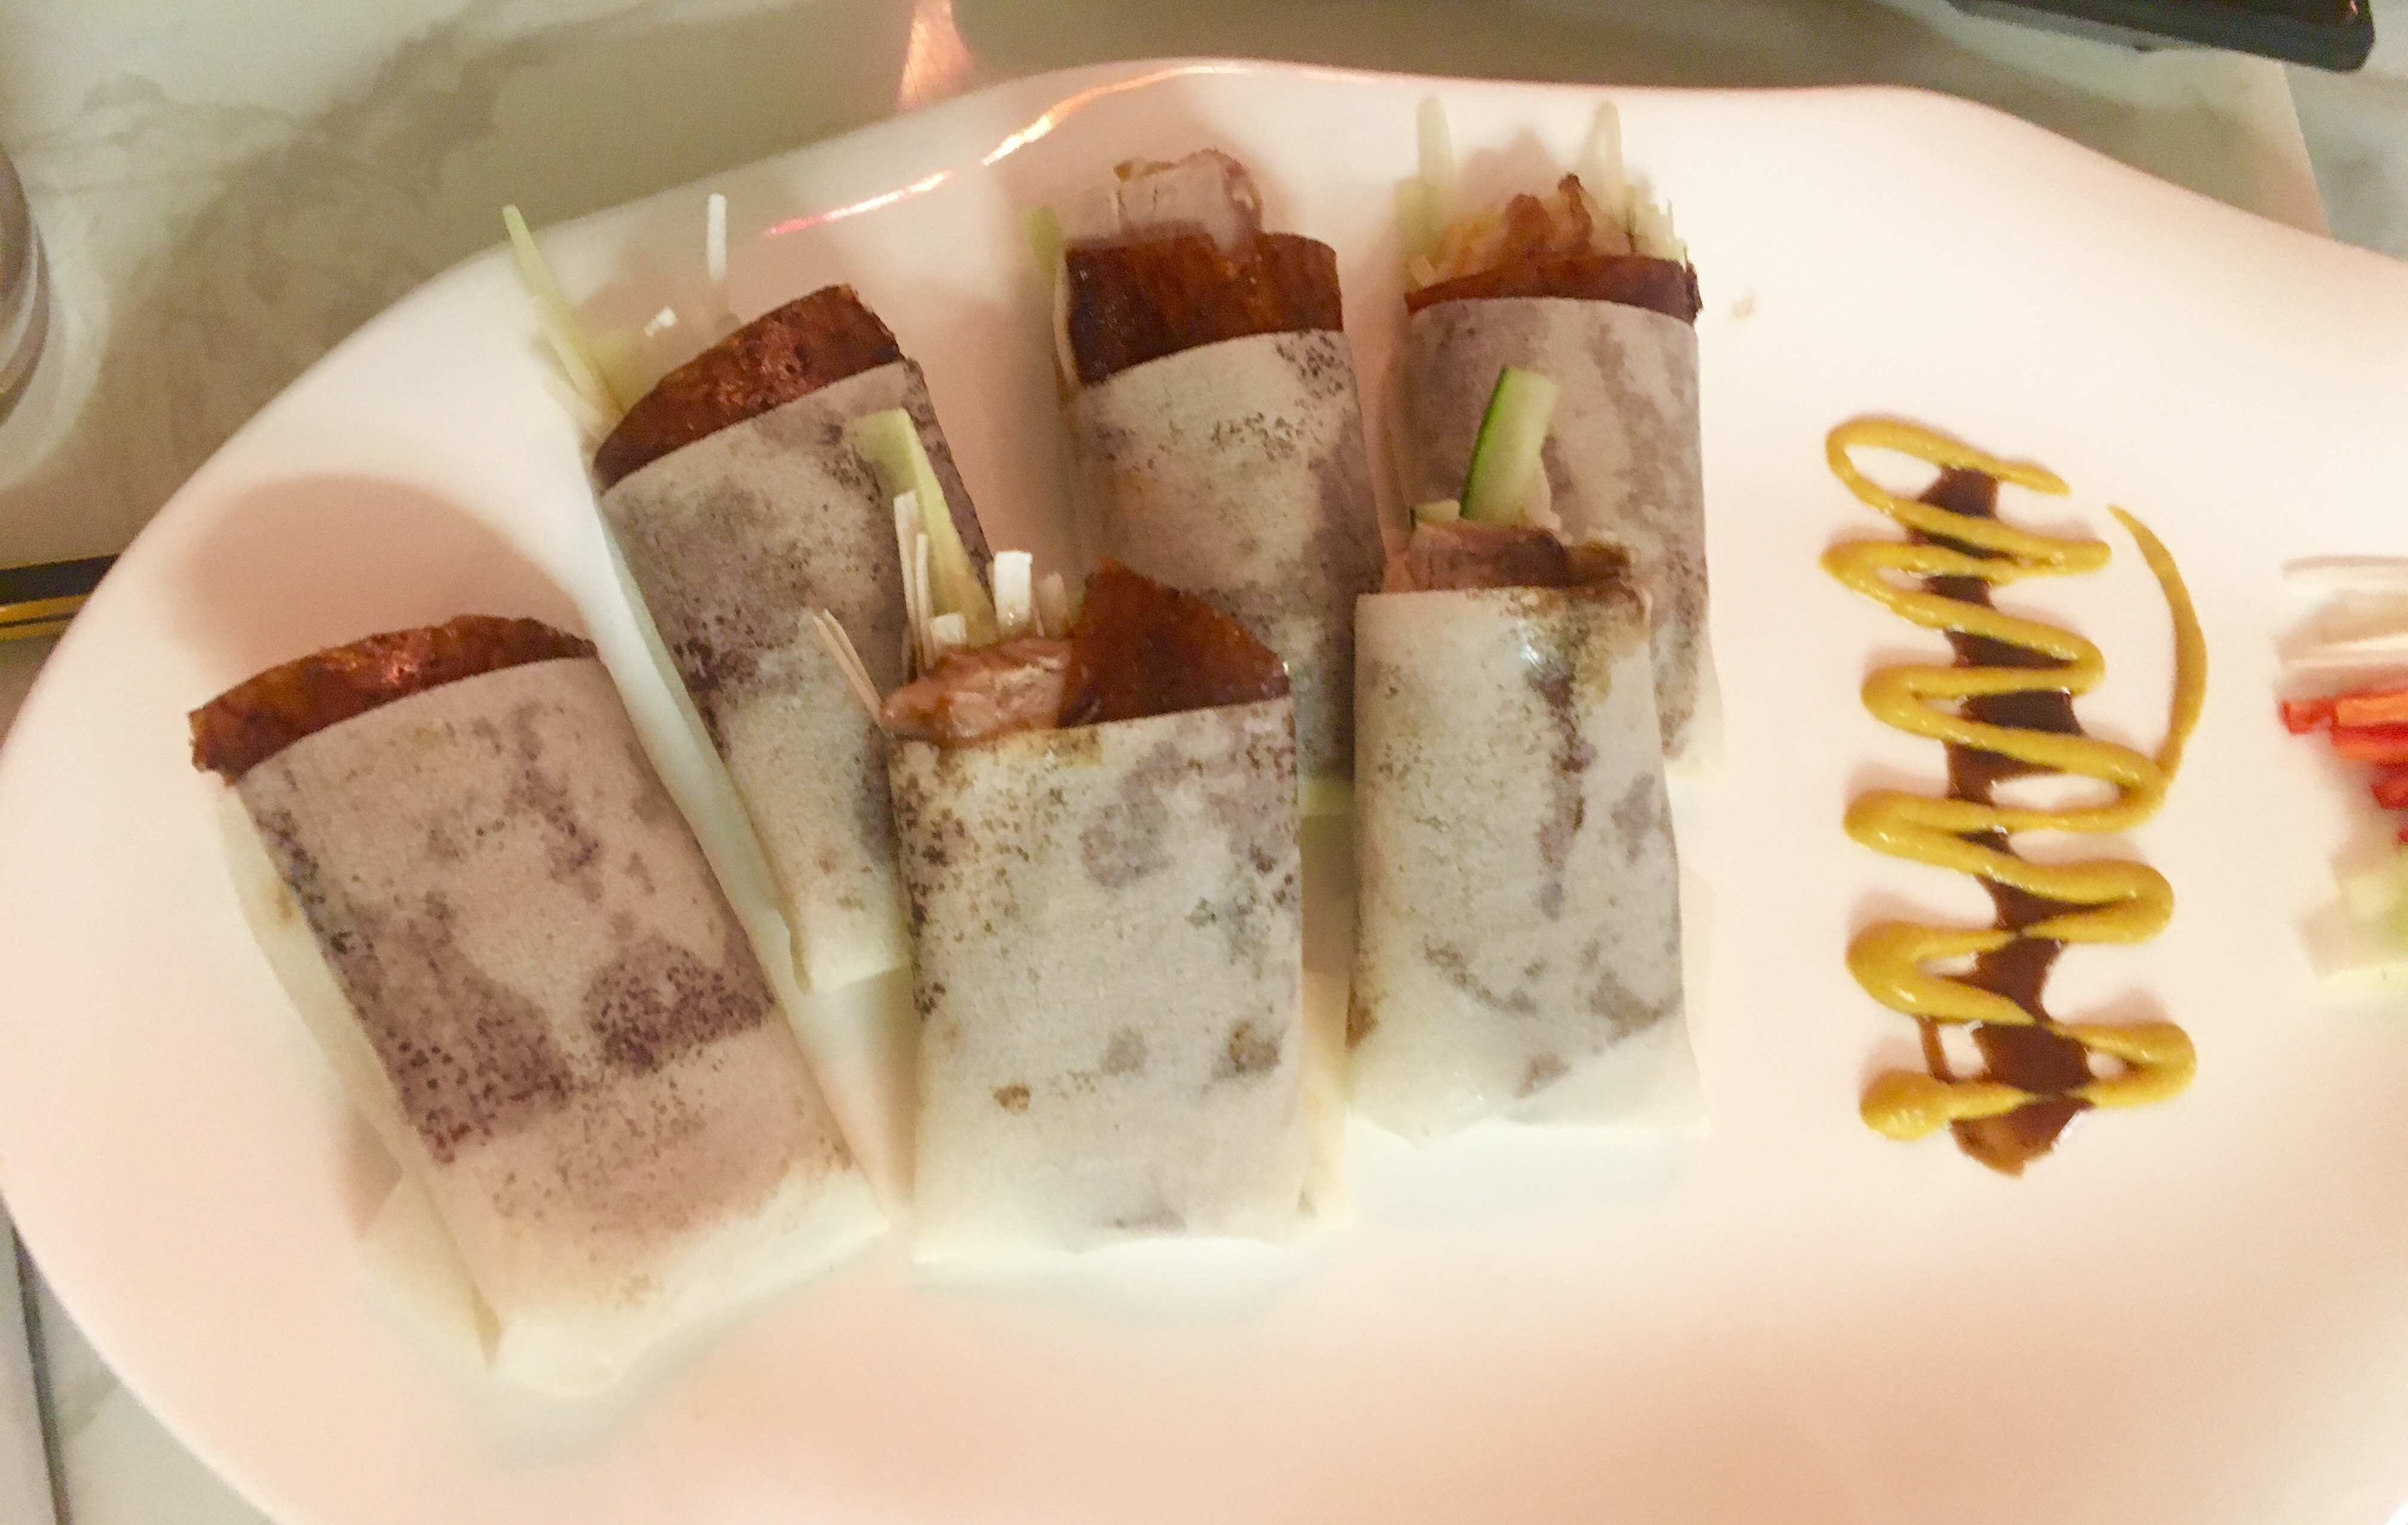 The Dim Sum Place - Smoked Peking Duck Wrap